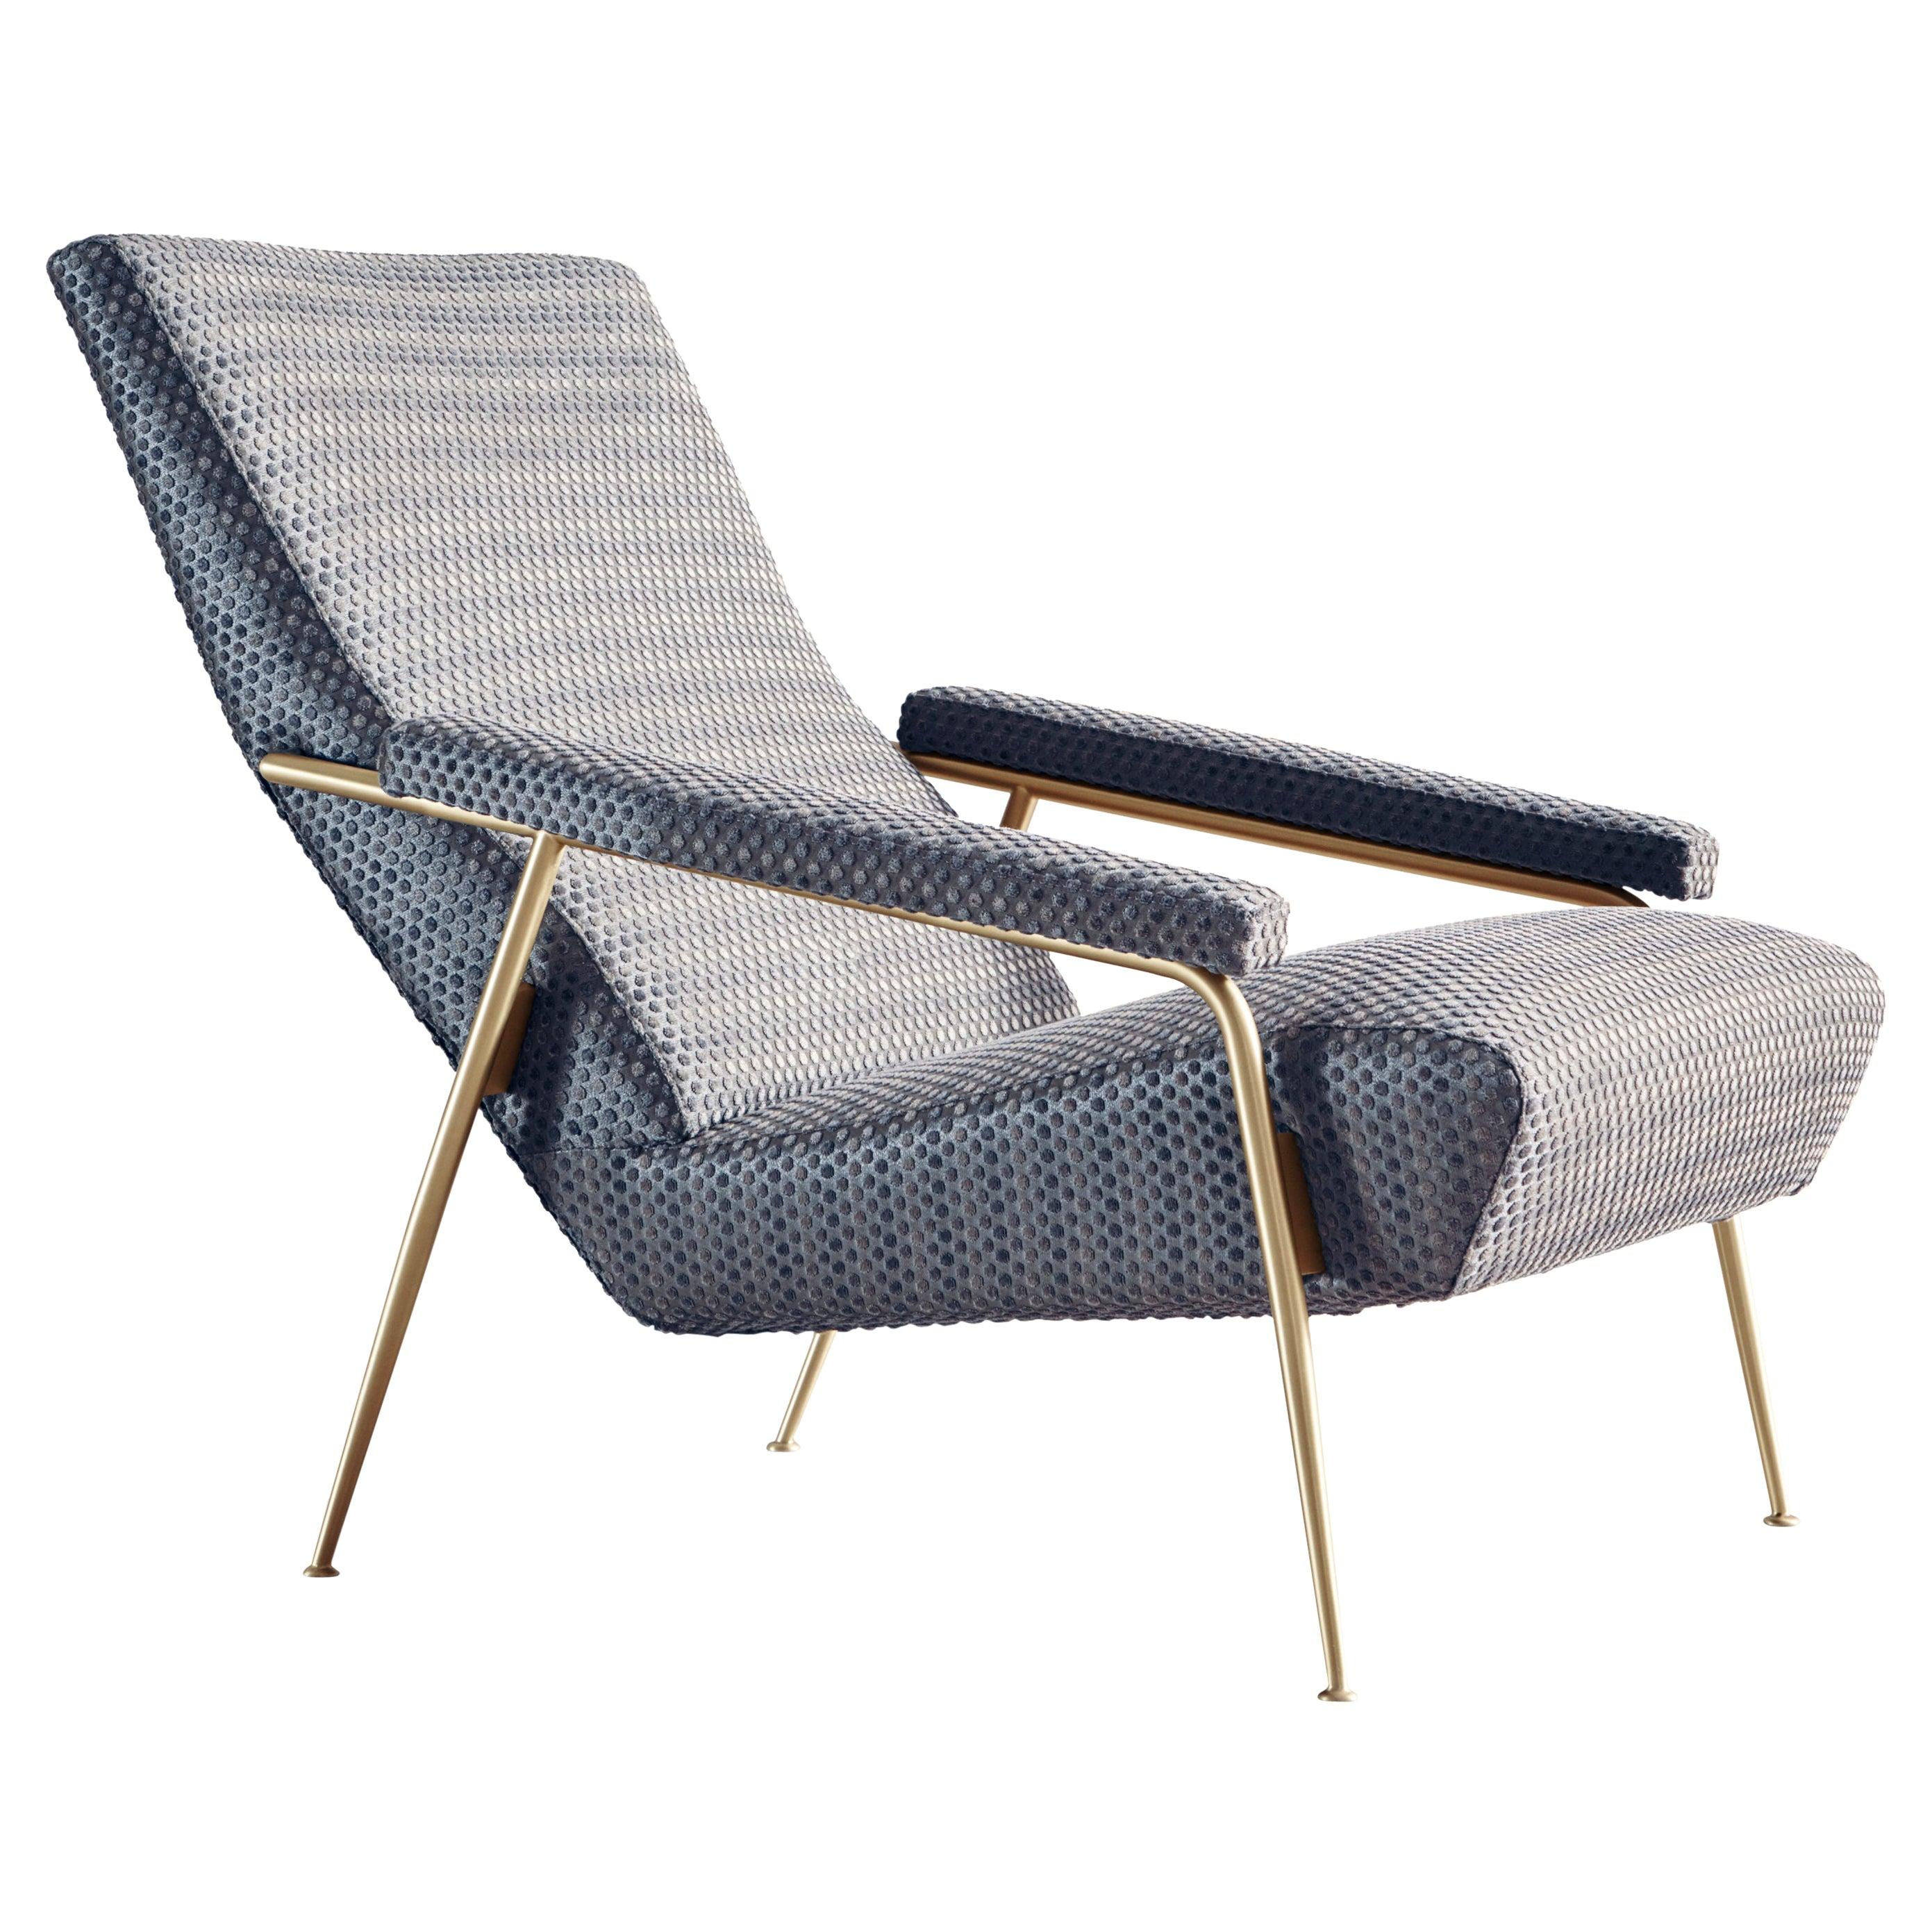 Molteni&C D.153.1 Armchair in Punteggiato Velvet by Gio Ponti